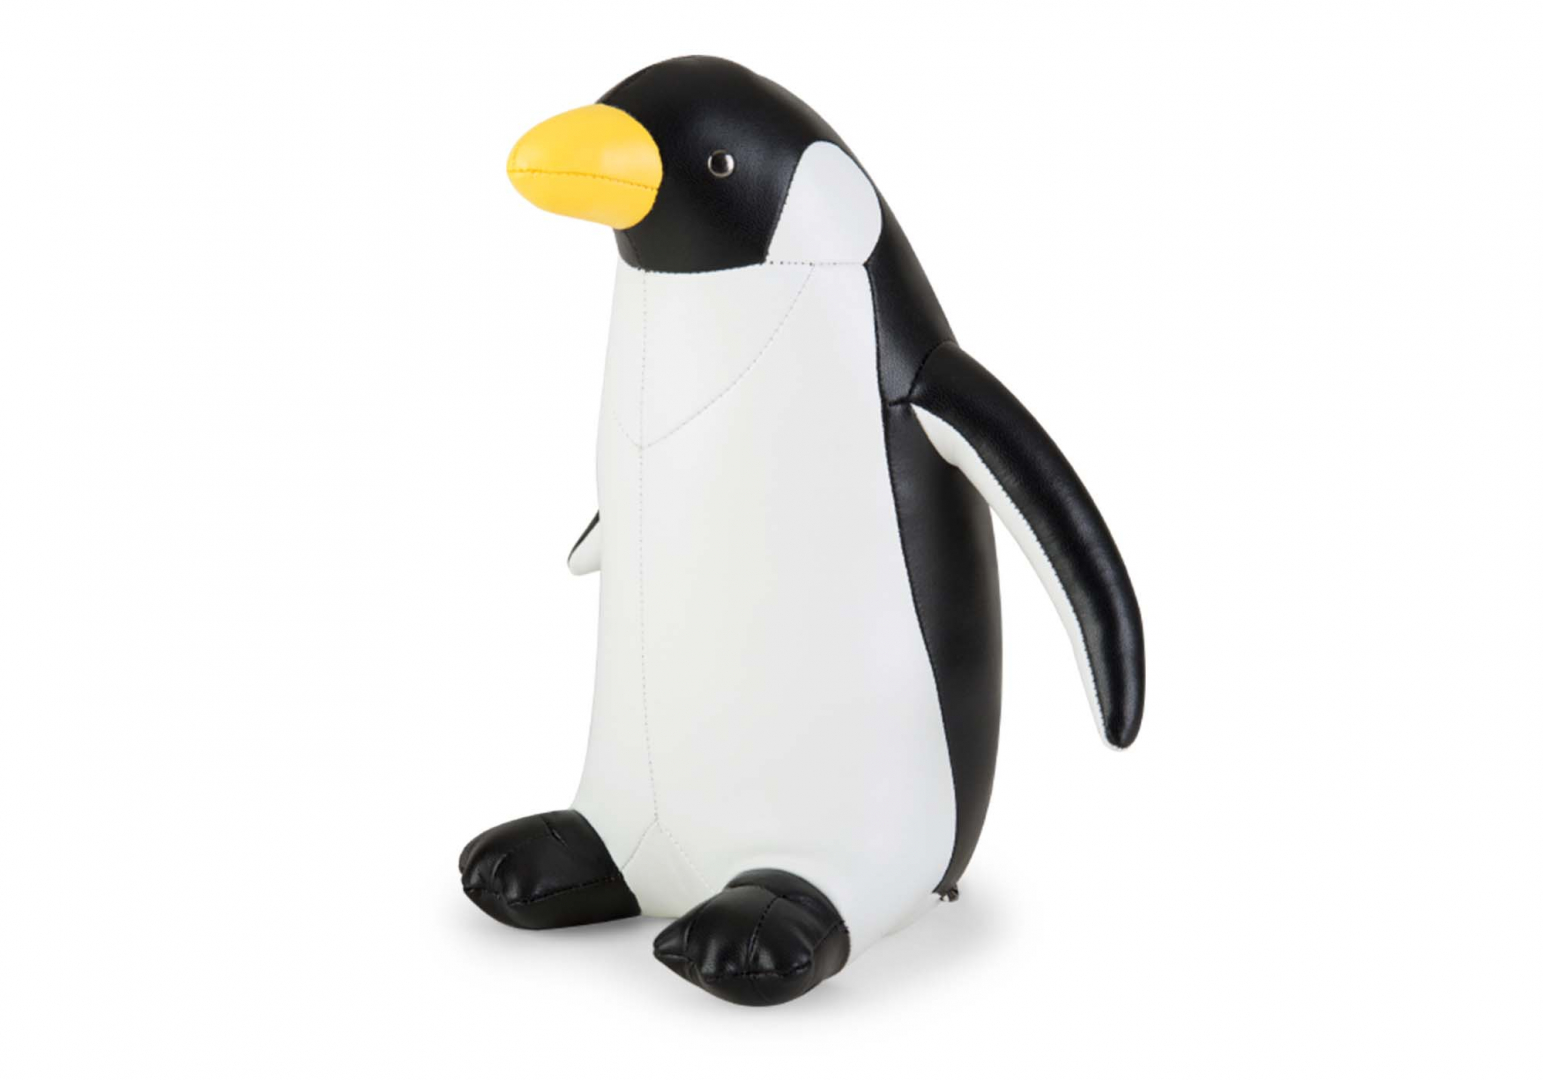 serre-livres design pingouin zuny